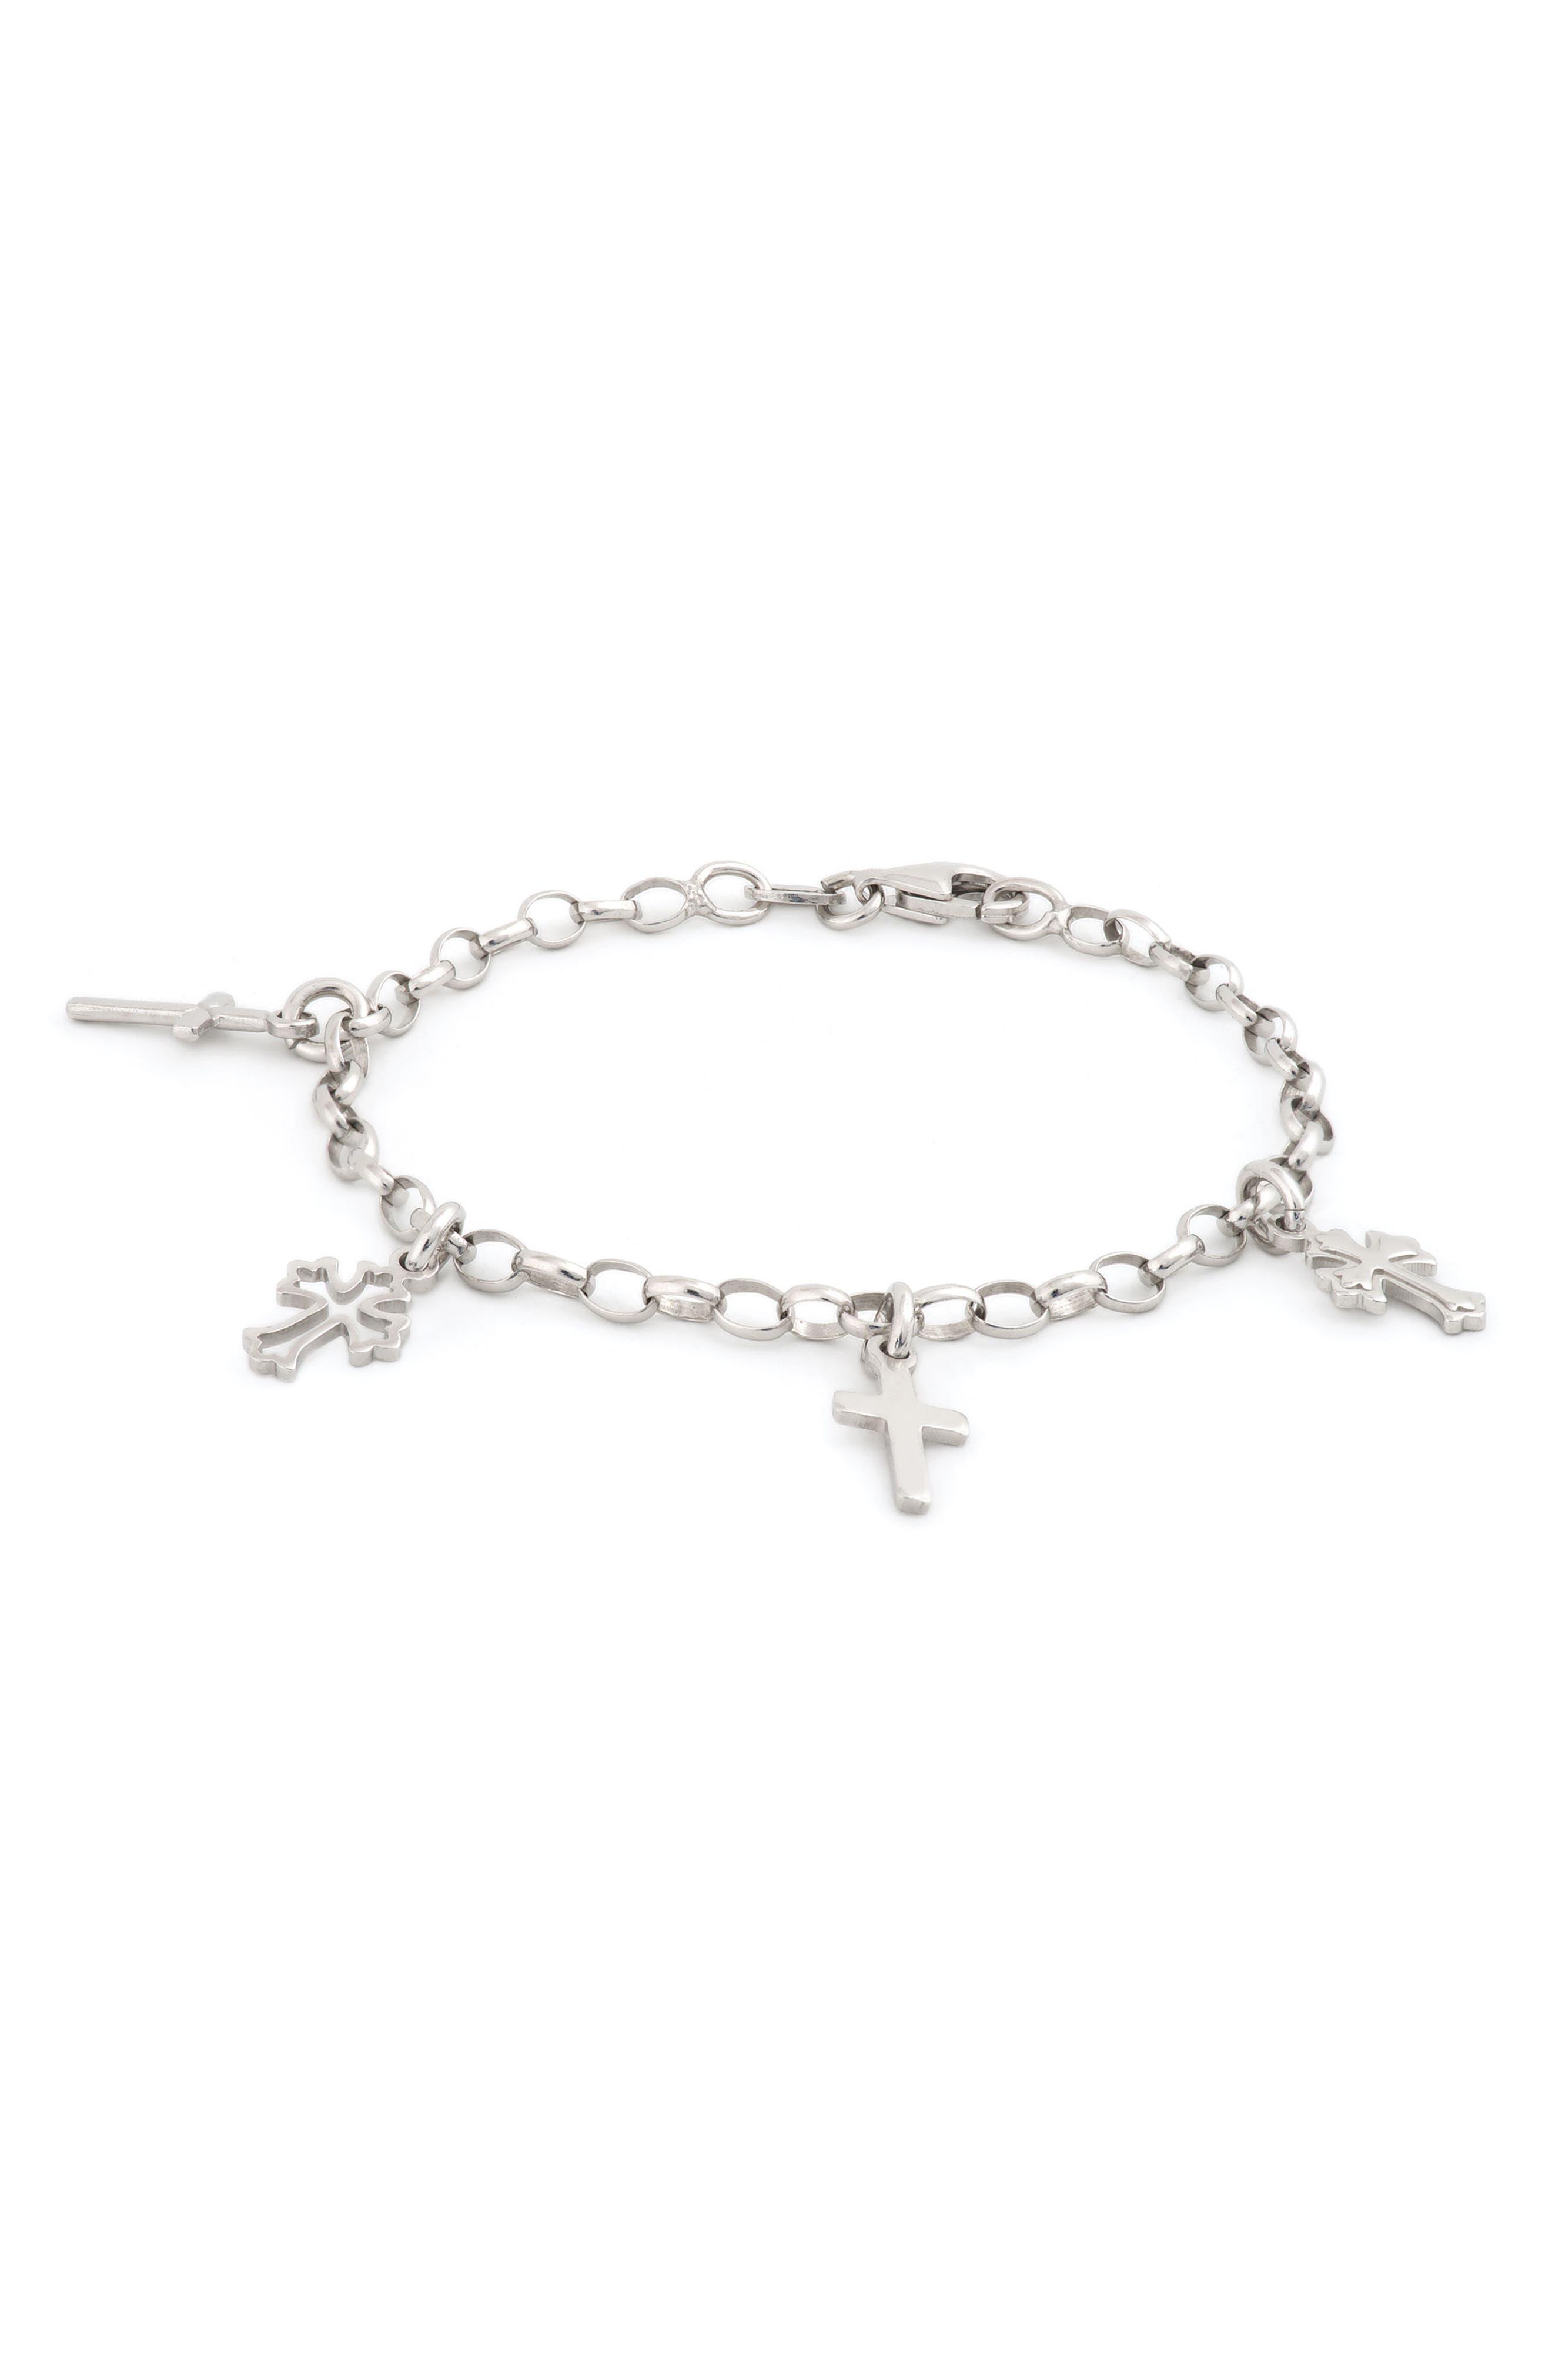 Sterling Silver Cross Bracelet,                         Main,                         color, Silver